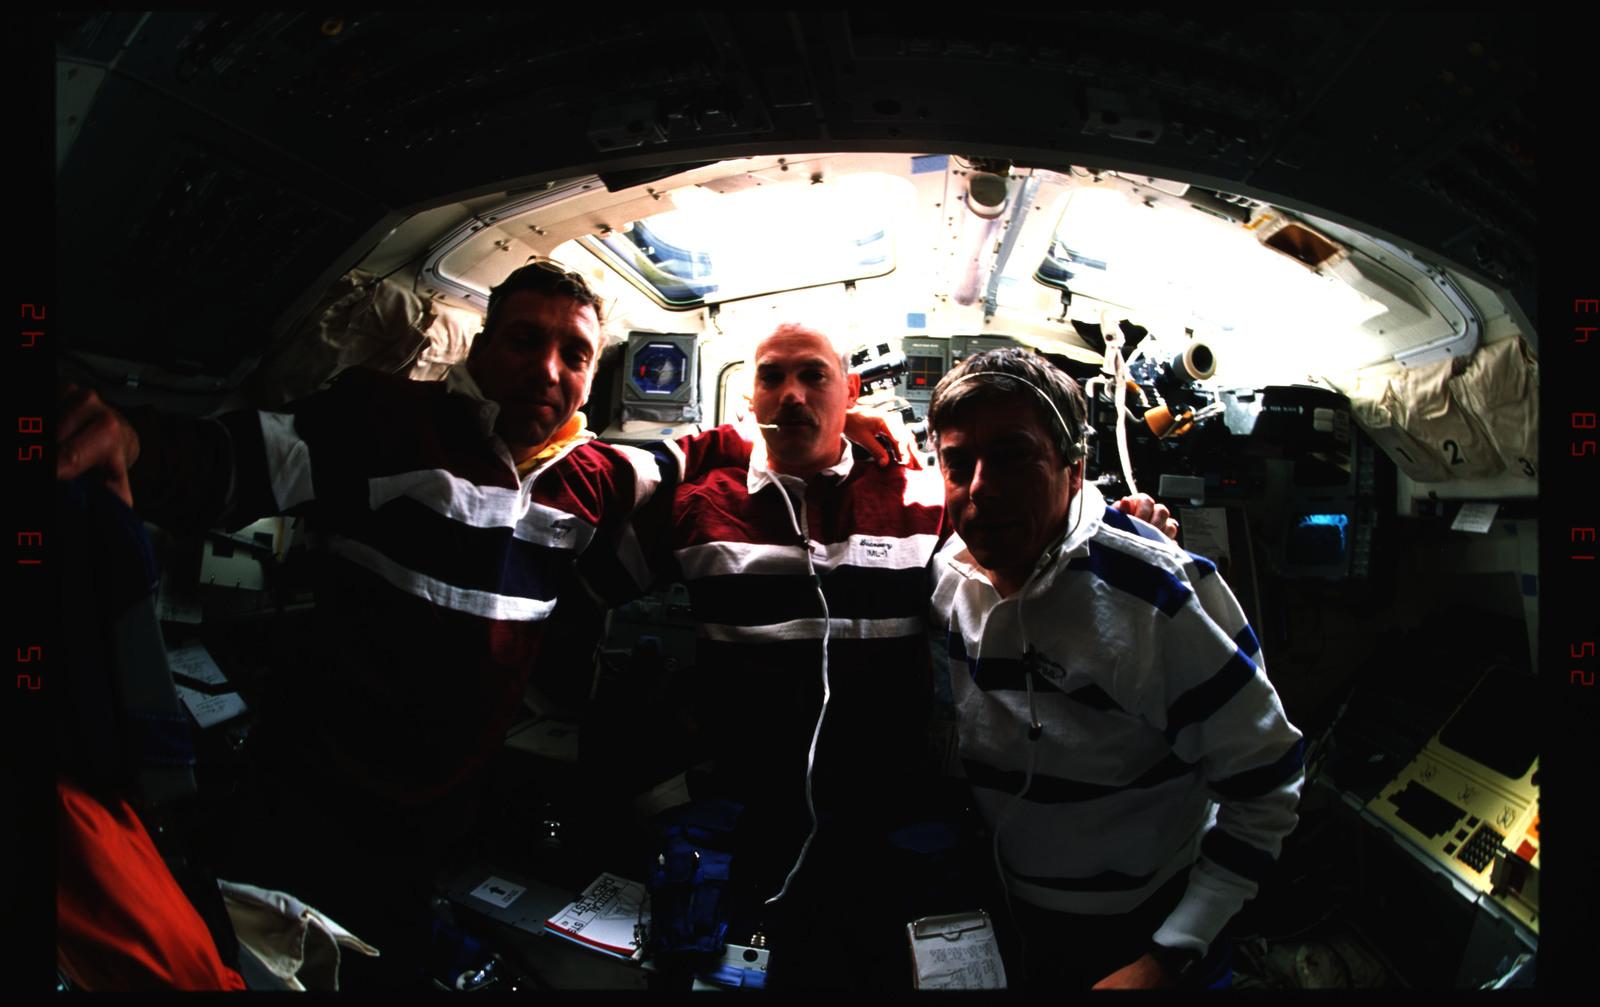 S42-37-025 - STS-042 - STS-42 crew activities